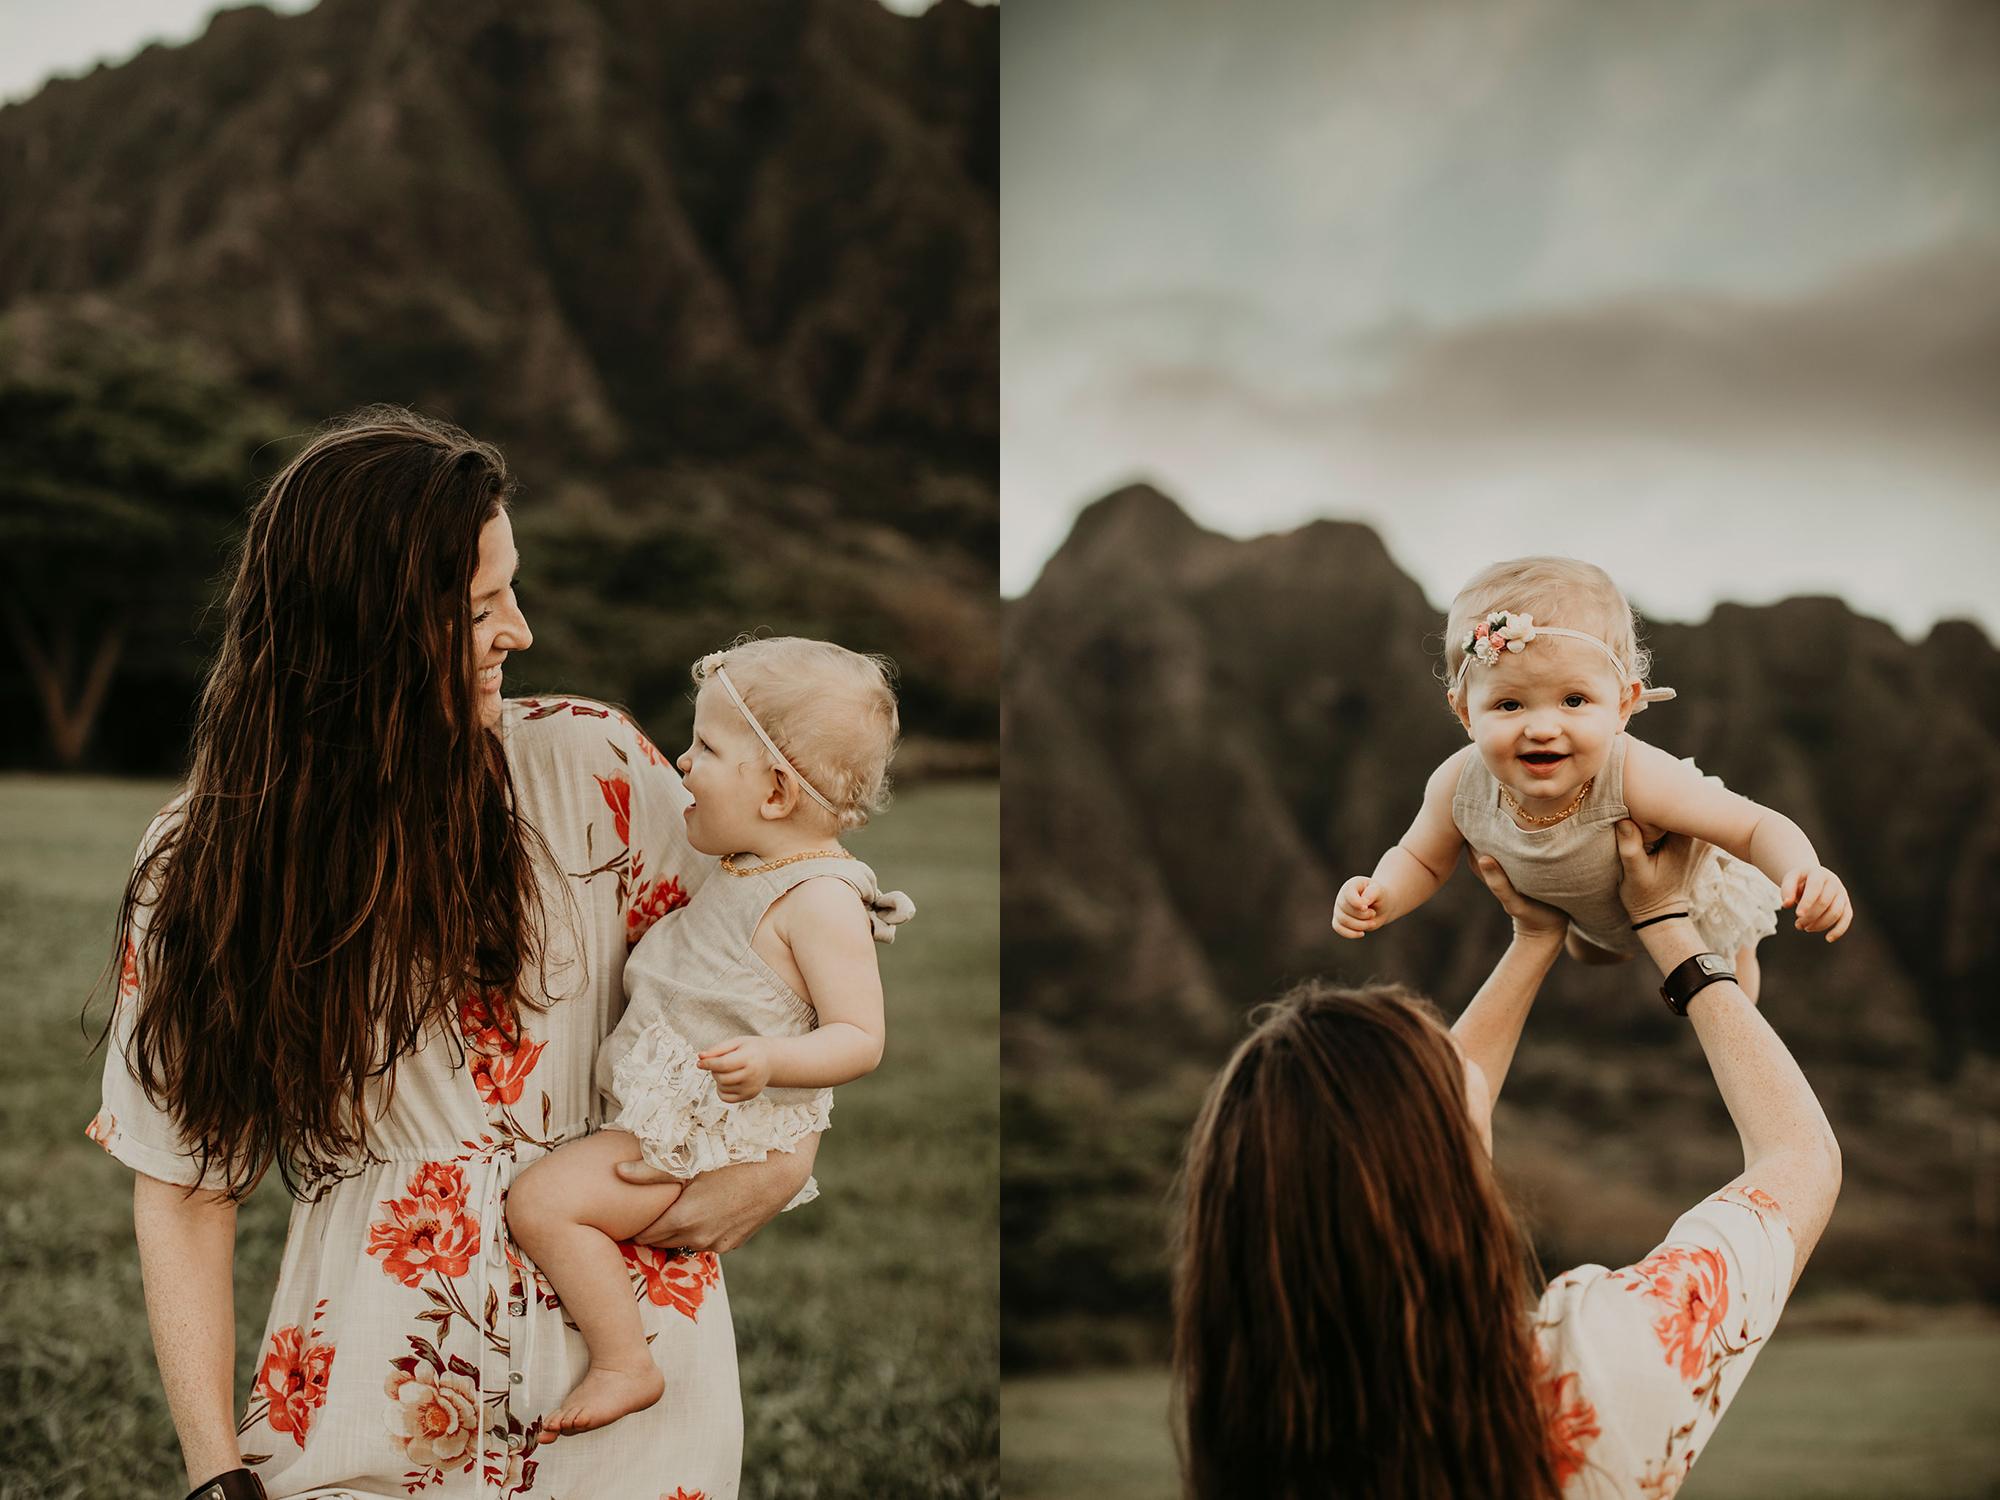 Sunrise-family-shoot-kualoa-ranch-01.jpg